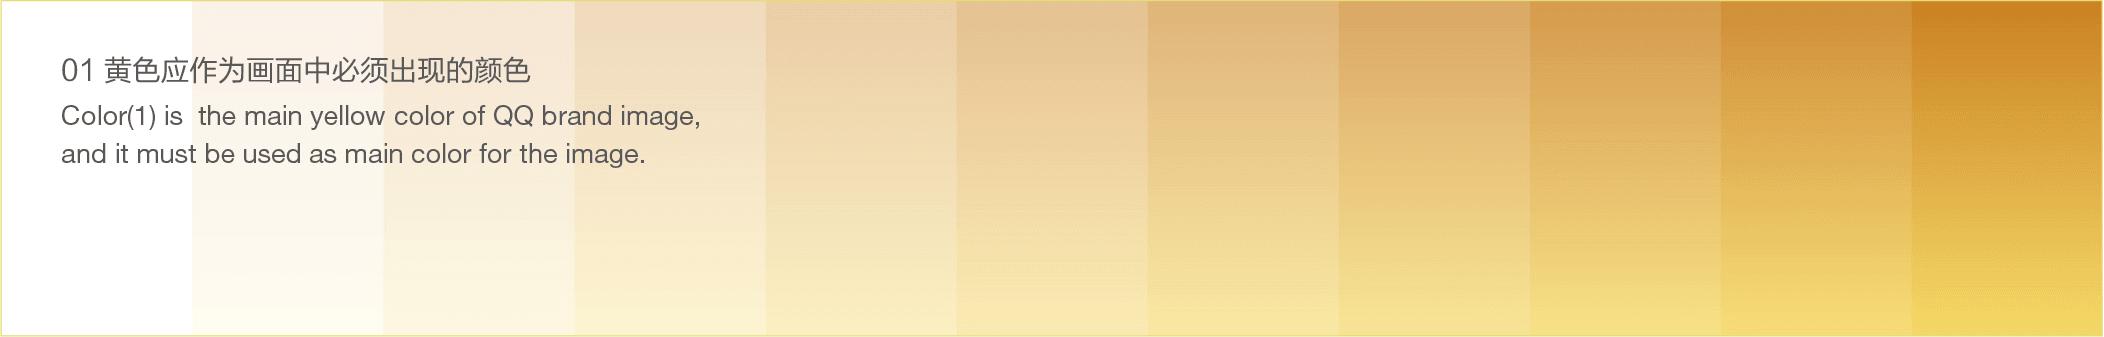 6-1517365200250